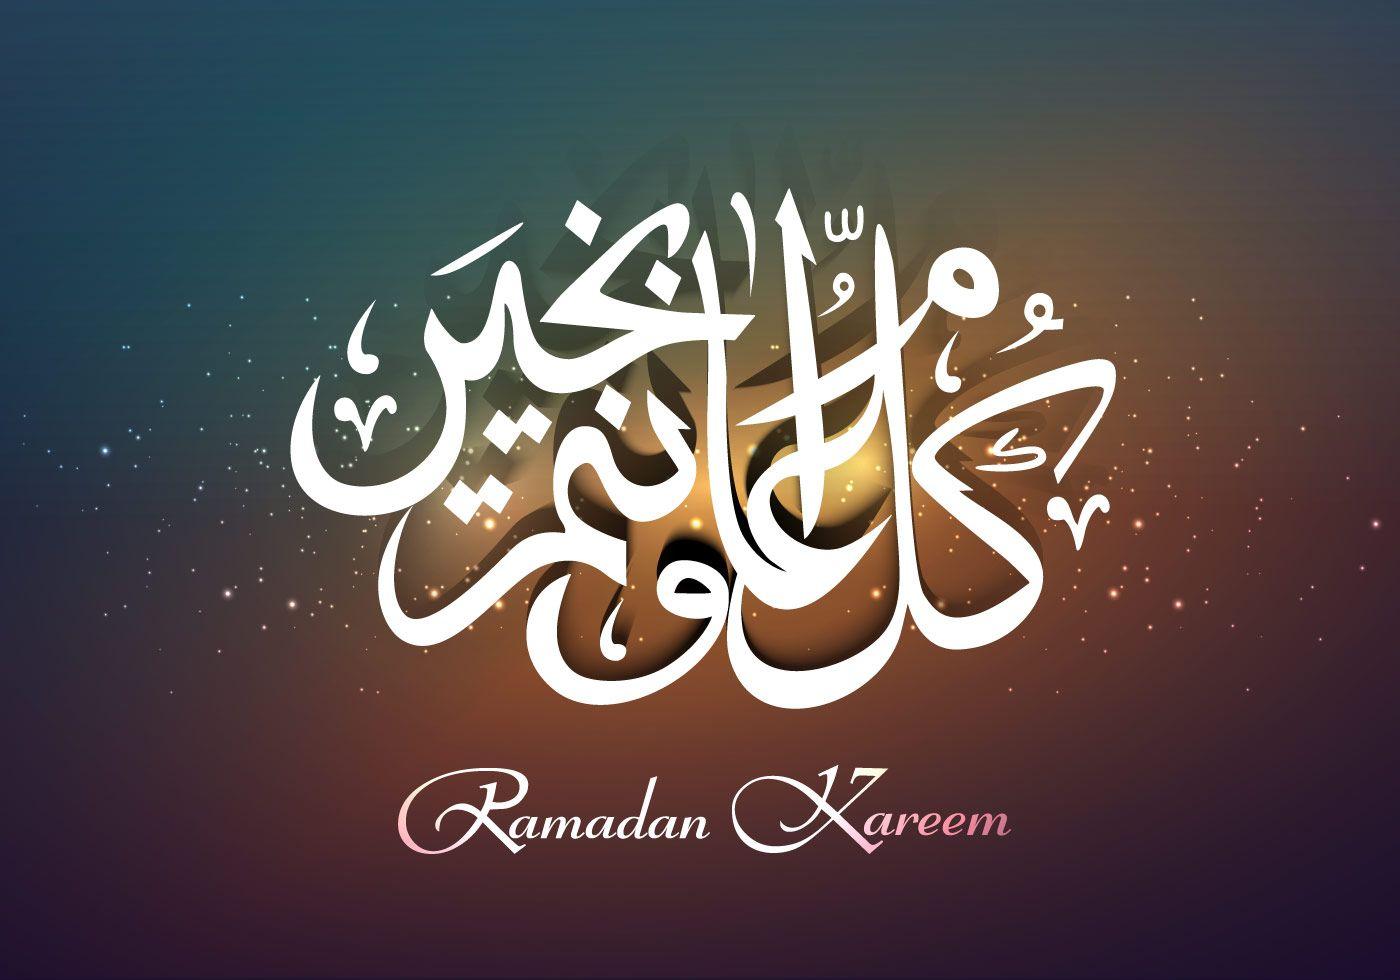 Ramadan Free Vector Art 531 Free Downloads Ramadan Kareem Ramadan Ramadan Kareem Vector